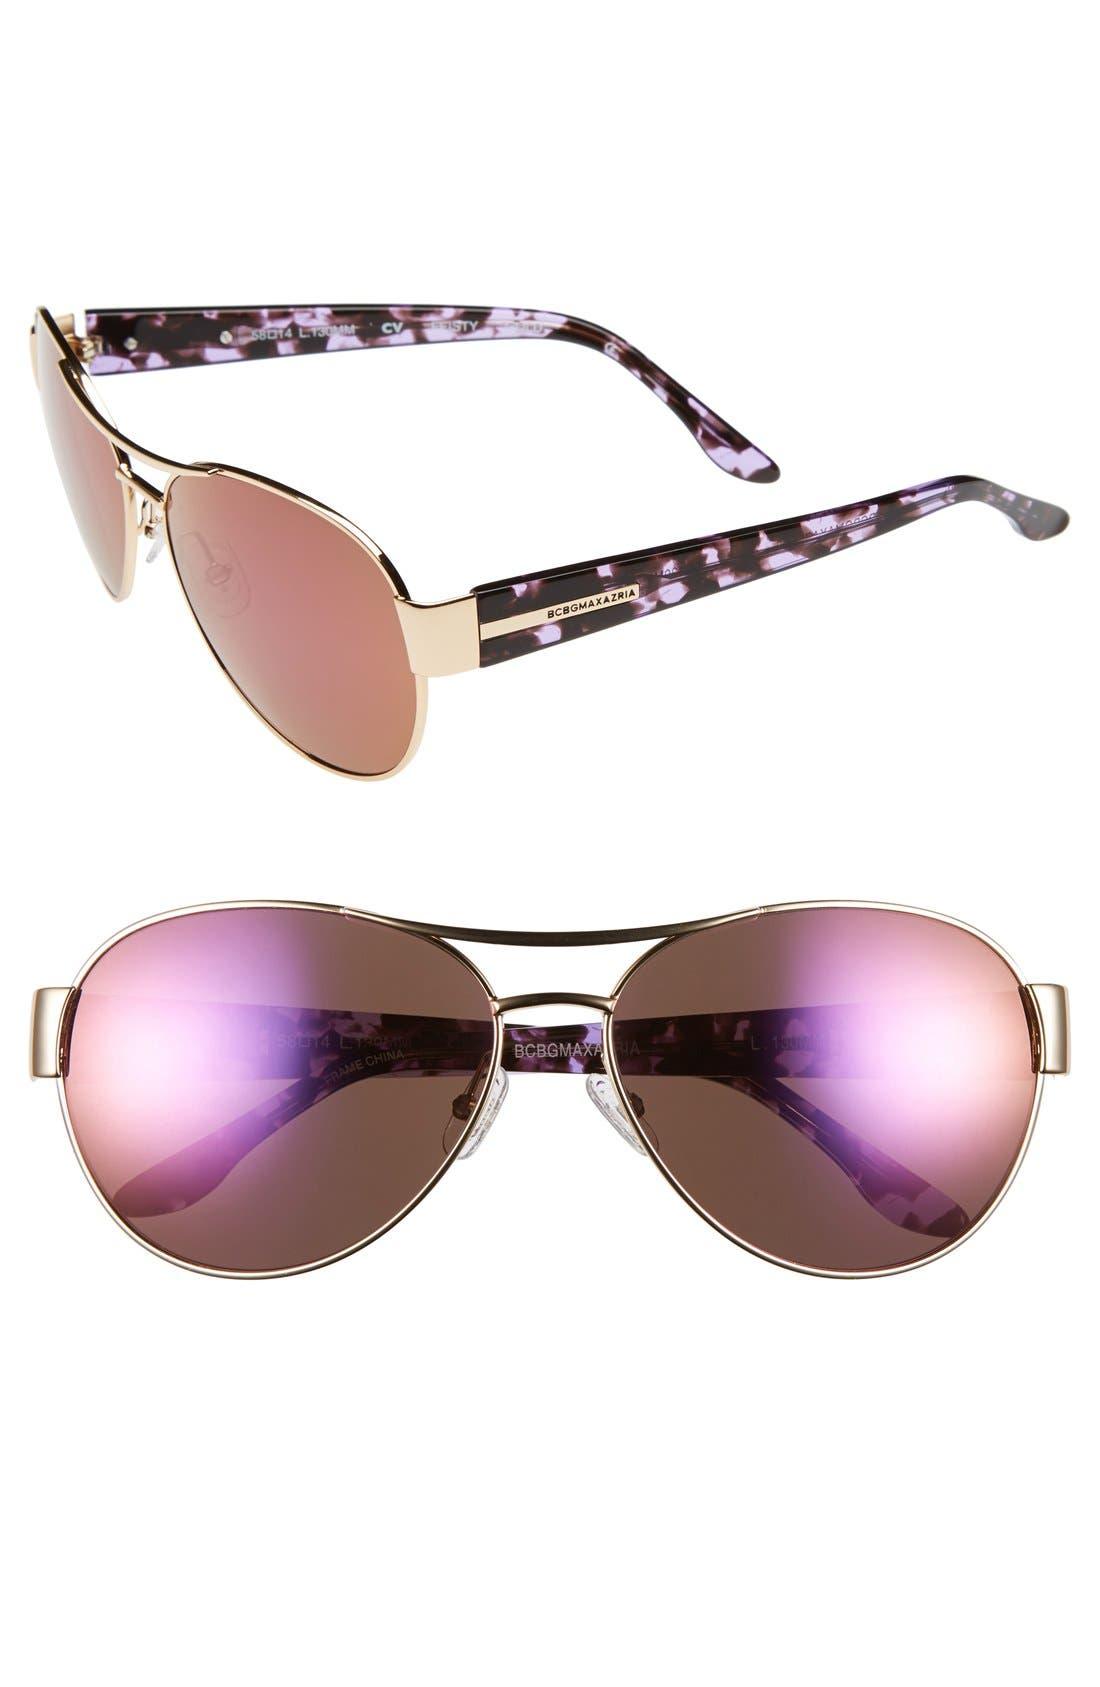 Alternate Image 1 Selected - BCBGMAXAZRIA 'Feisty' 58mm Sunglasses